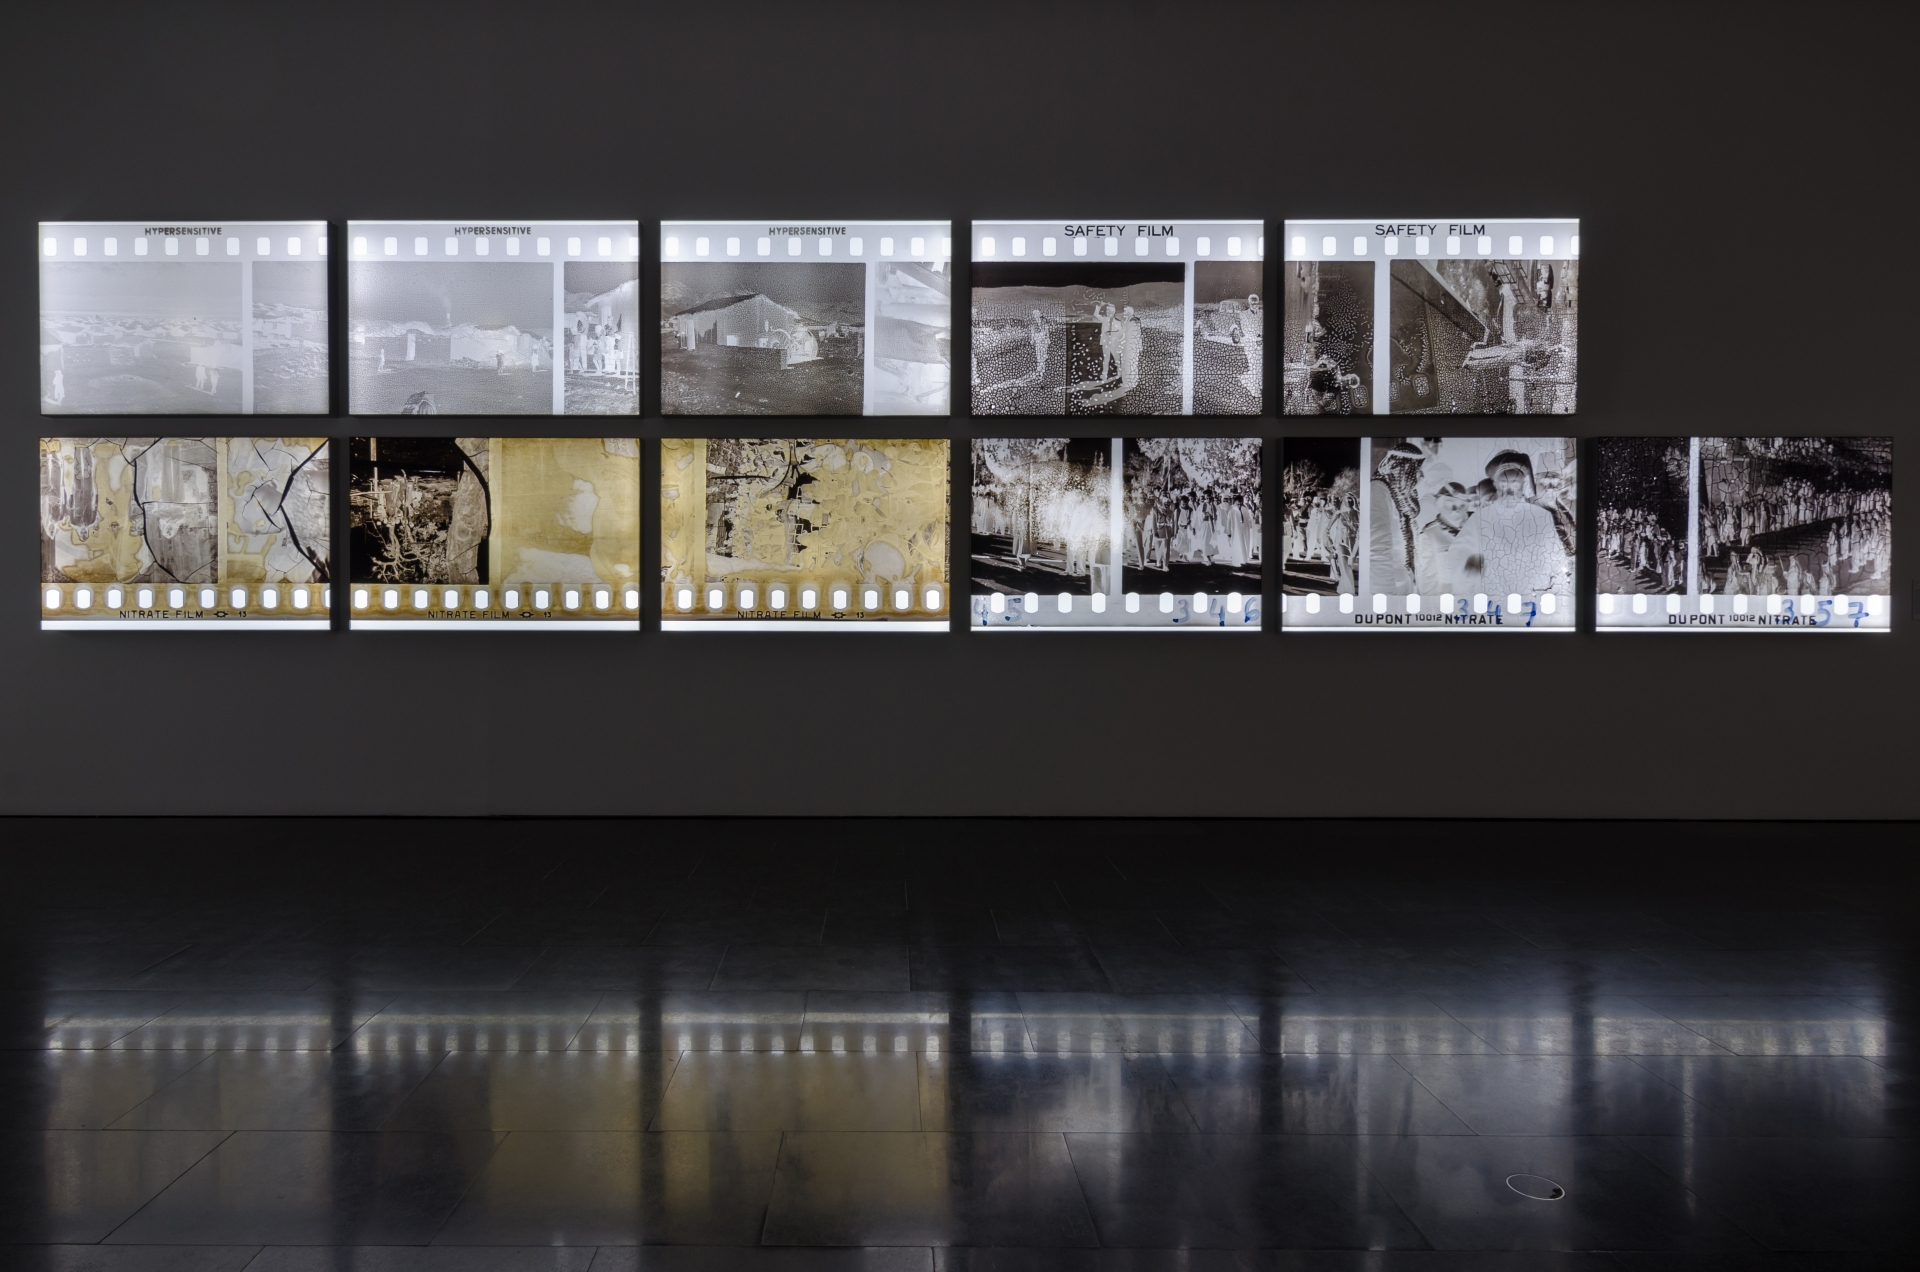 The Body Of Film, 2017, 14 pigment inkjet prints on backlit UV cloth, 100 x 150 x 10 cm each. Installation view MACBA, Barcelona. © Mirjan Mahmoud